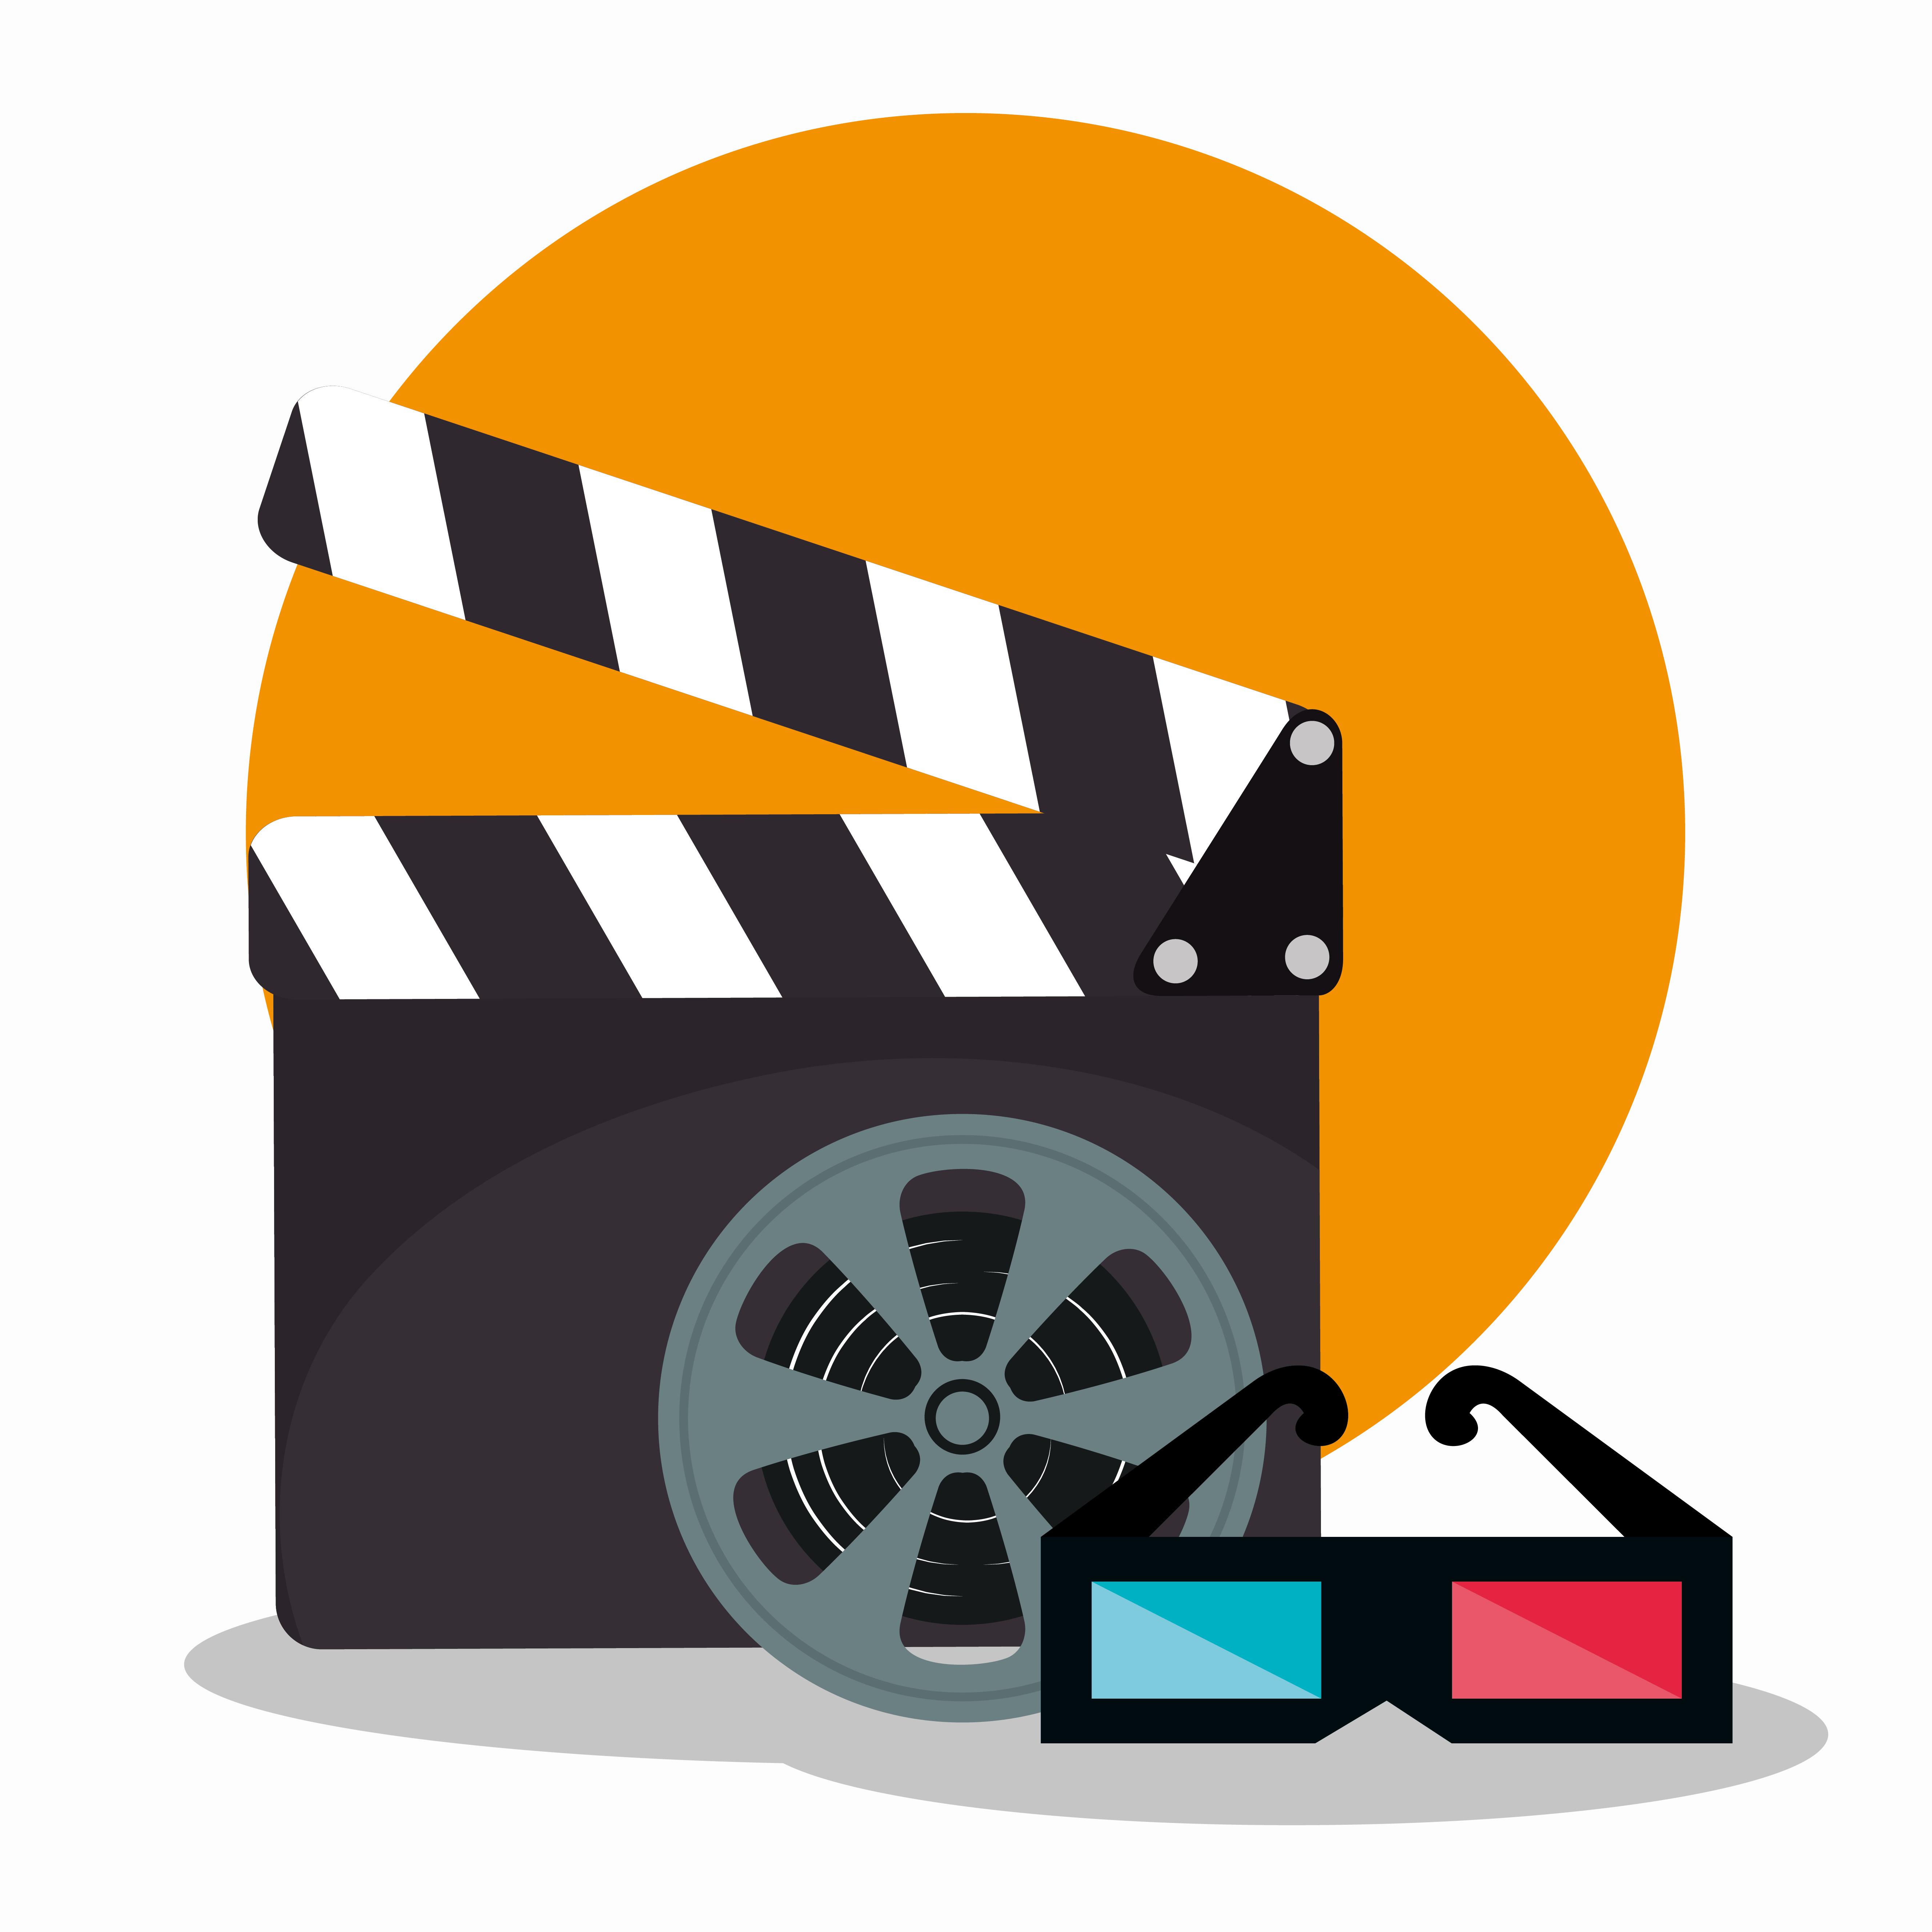 Clipart Kino Kostenlos